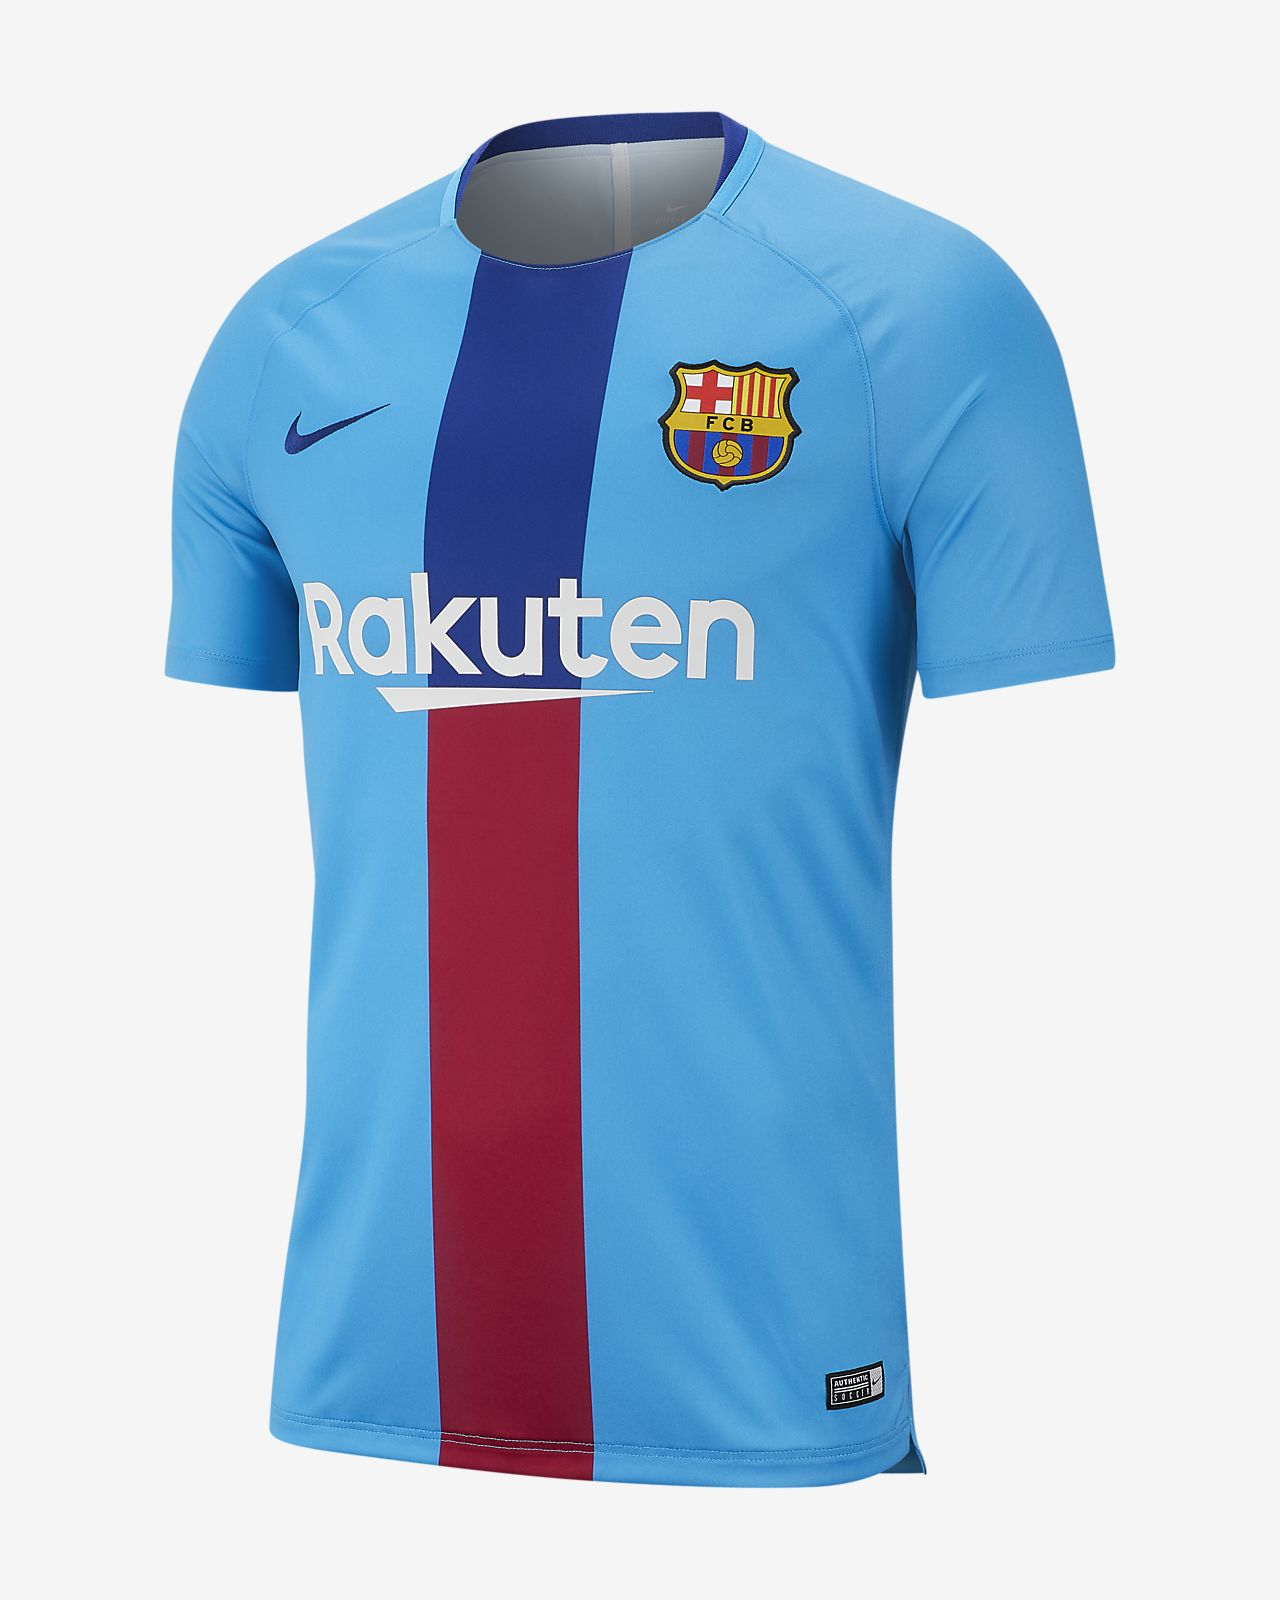 3170b6dc2ddb4 ... Nike Dri-FIT FC Barcelona Squad Camiseta de fútbol de manga corta con  estampado -